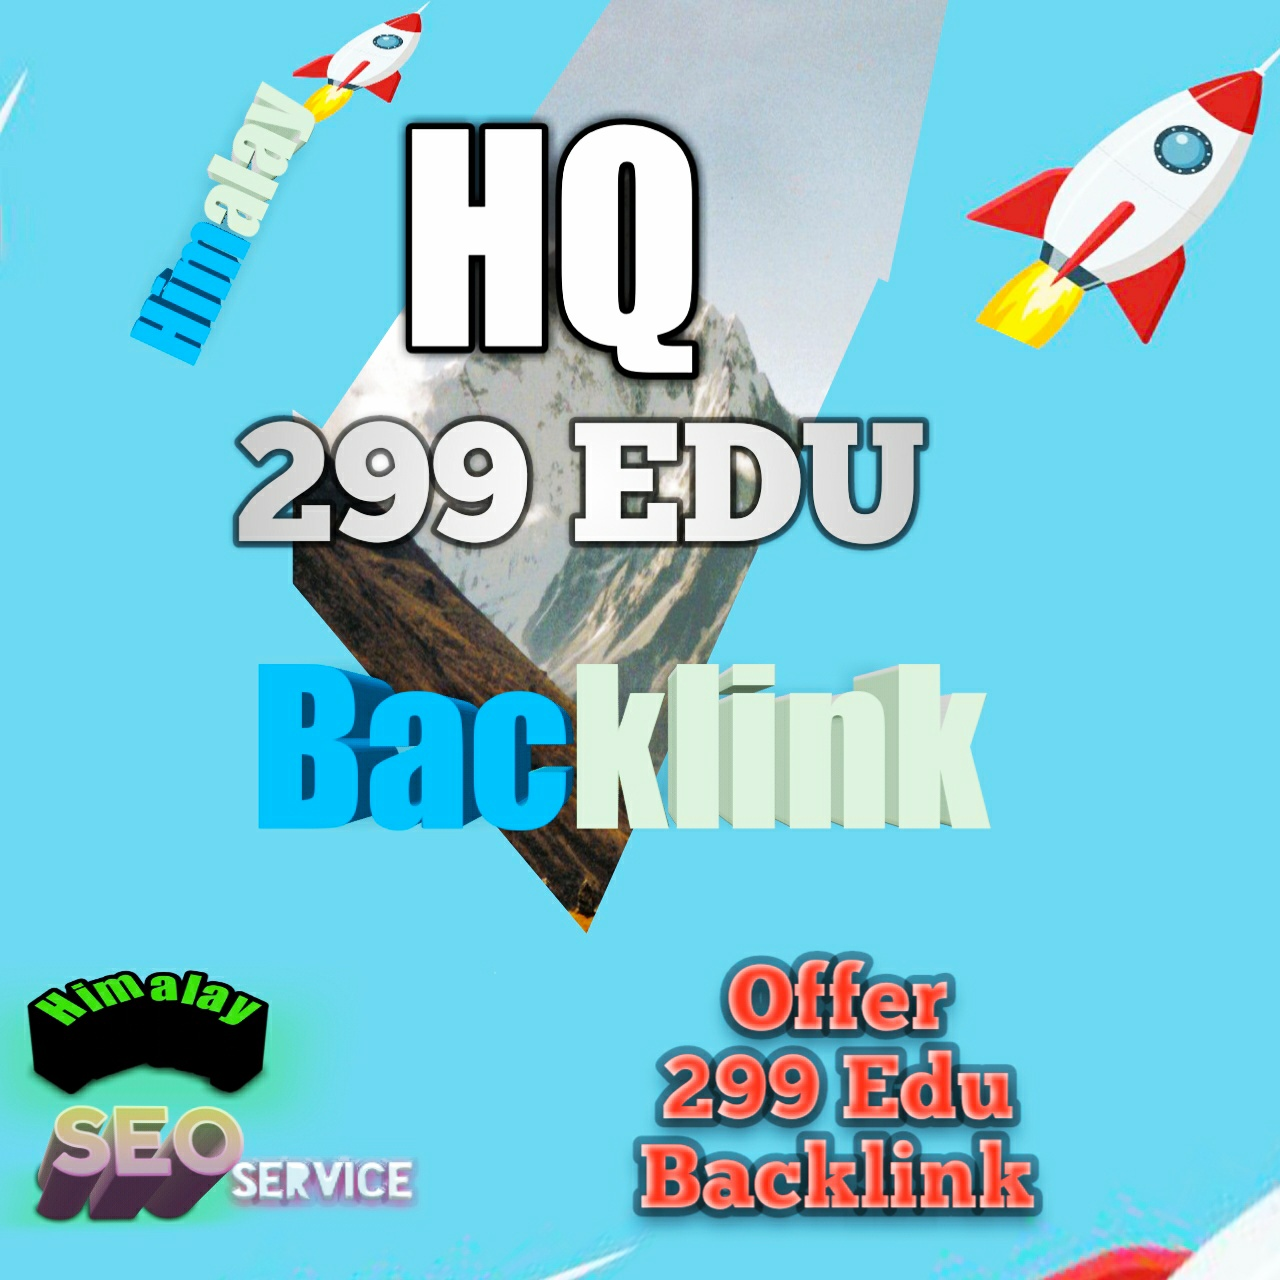 Now get most popular EDU Site 299 HQ Edu Backlink